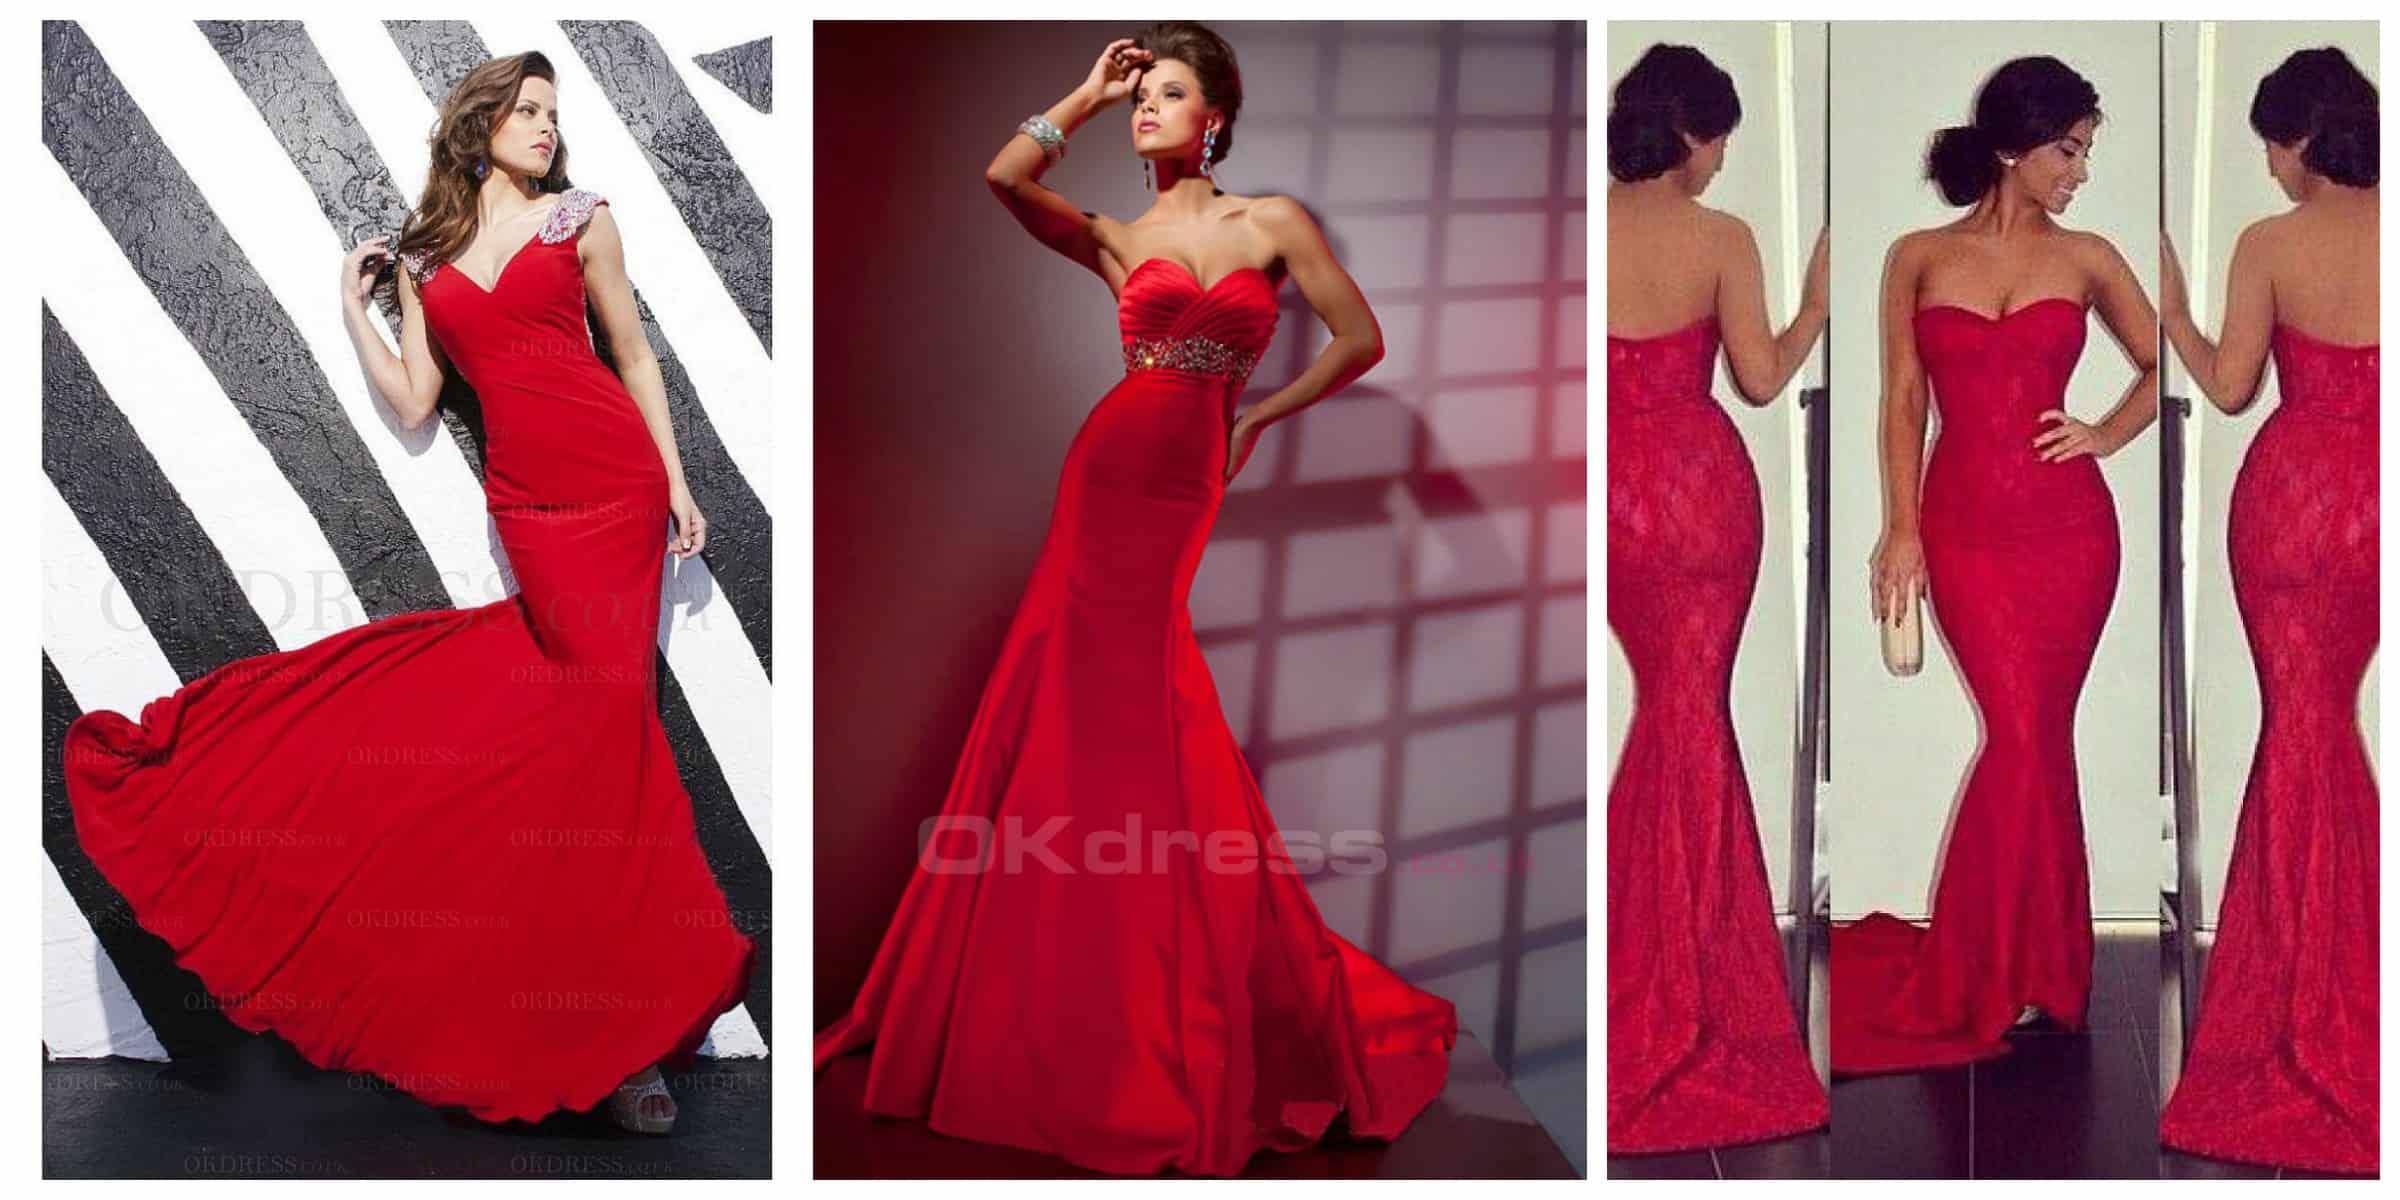 red-evening-dress-okdresses